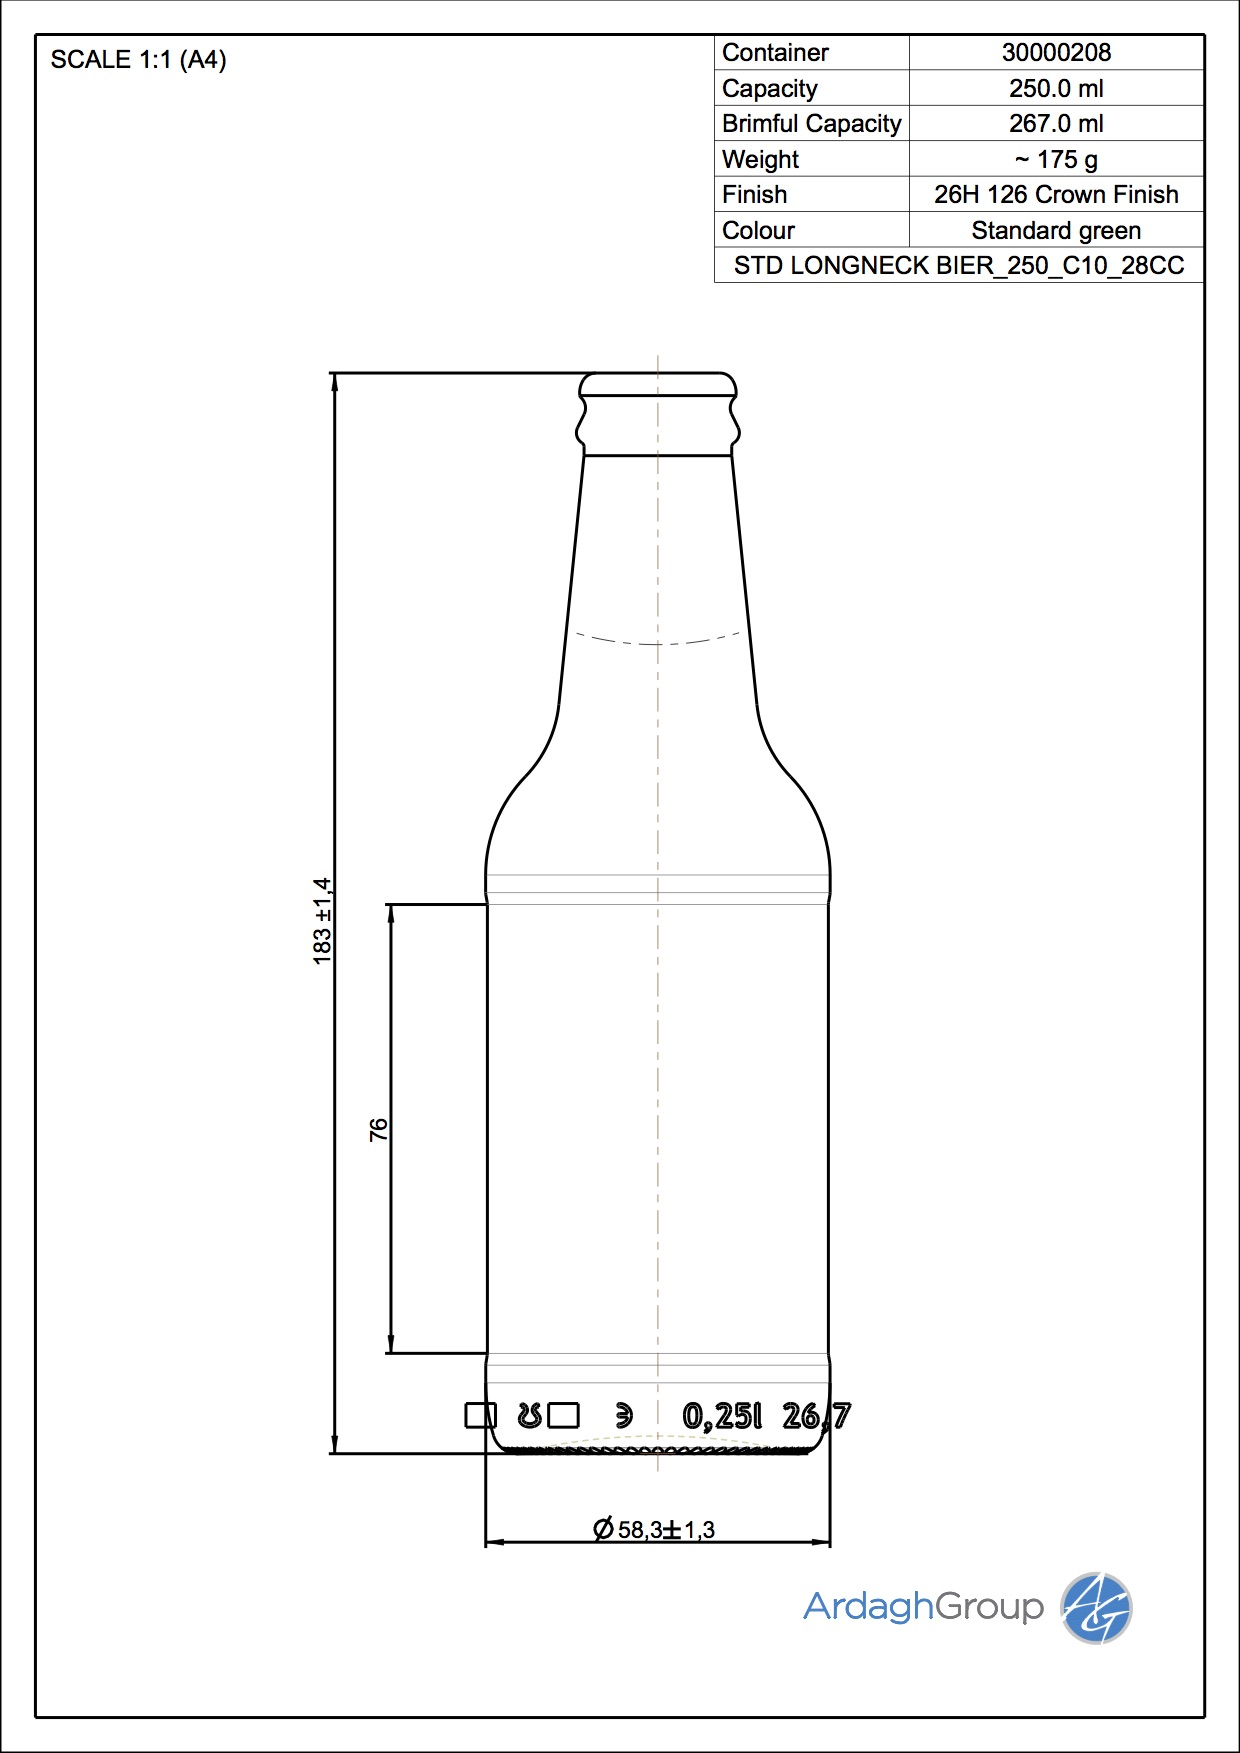 LONGNECK BIER 250 C10 28CC